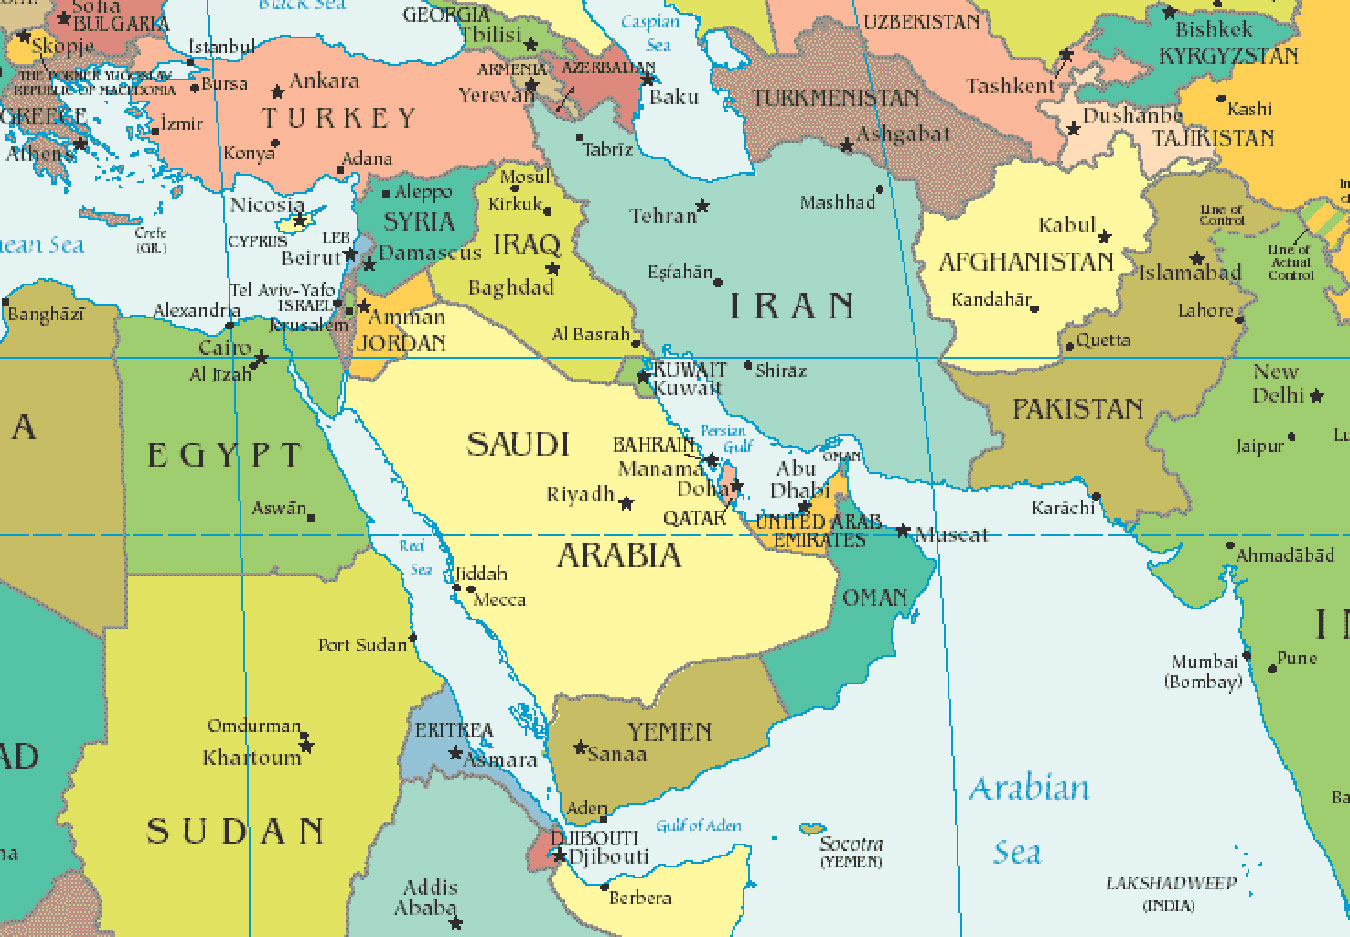 иран страна террорист: